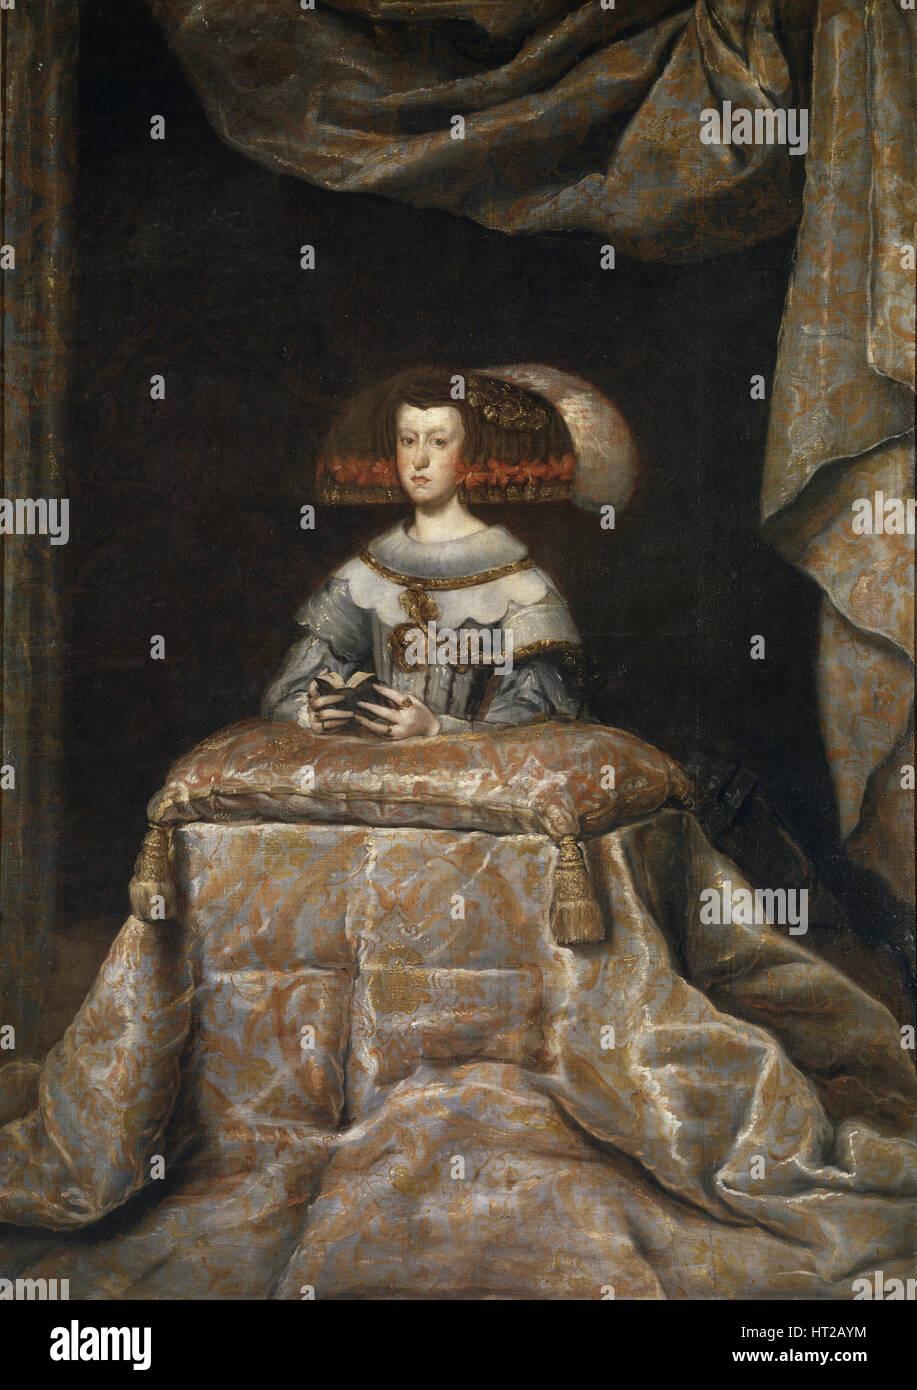 Portrait of Mariana of Austria (1634?1696), praying, c. 1655. Artist: Velàzquez, Diego (1599-1660) - Stock Image